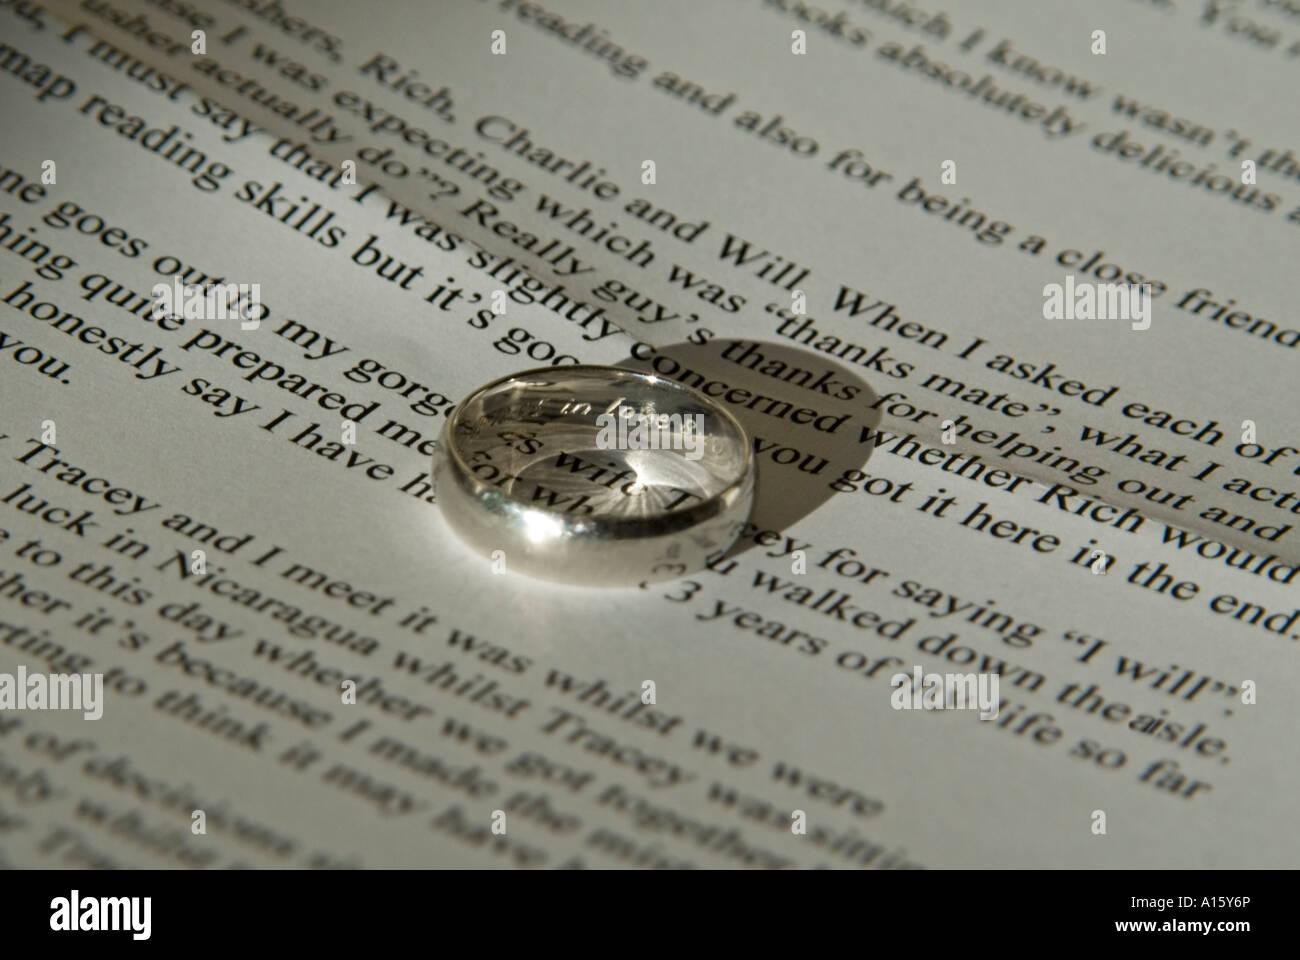 Horizontal close up of a Grooms inscribed platinum wedding ring